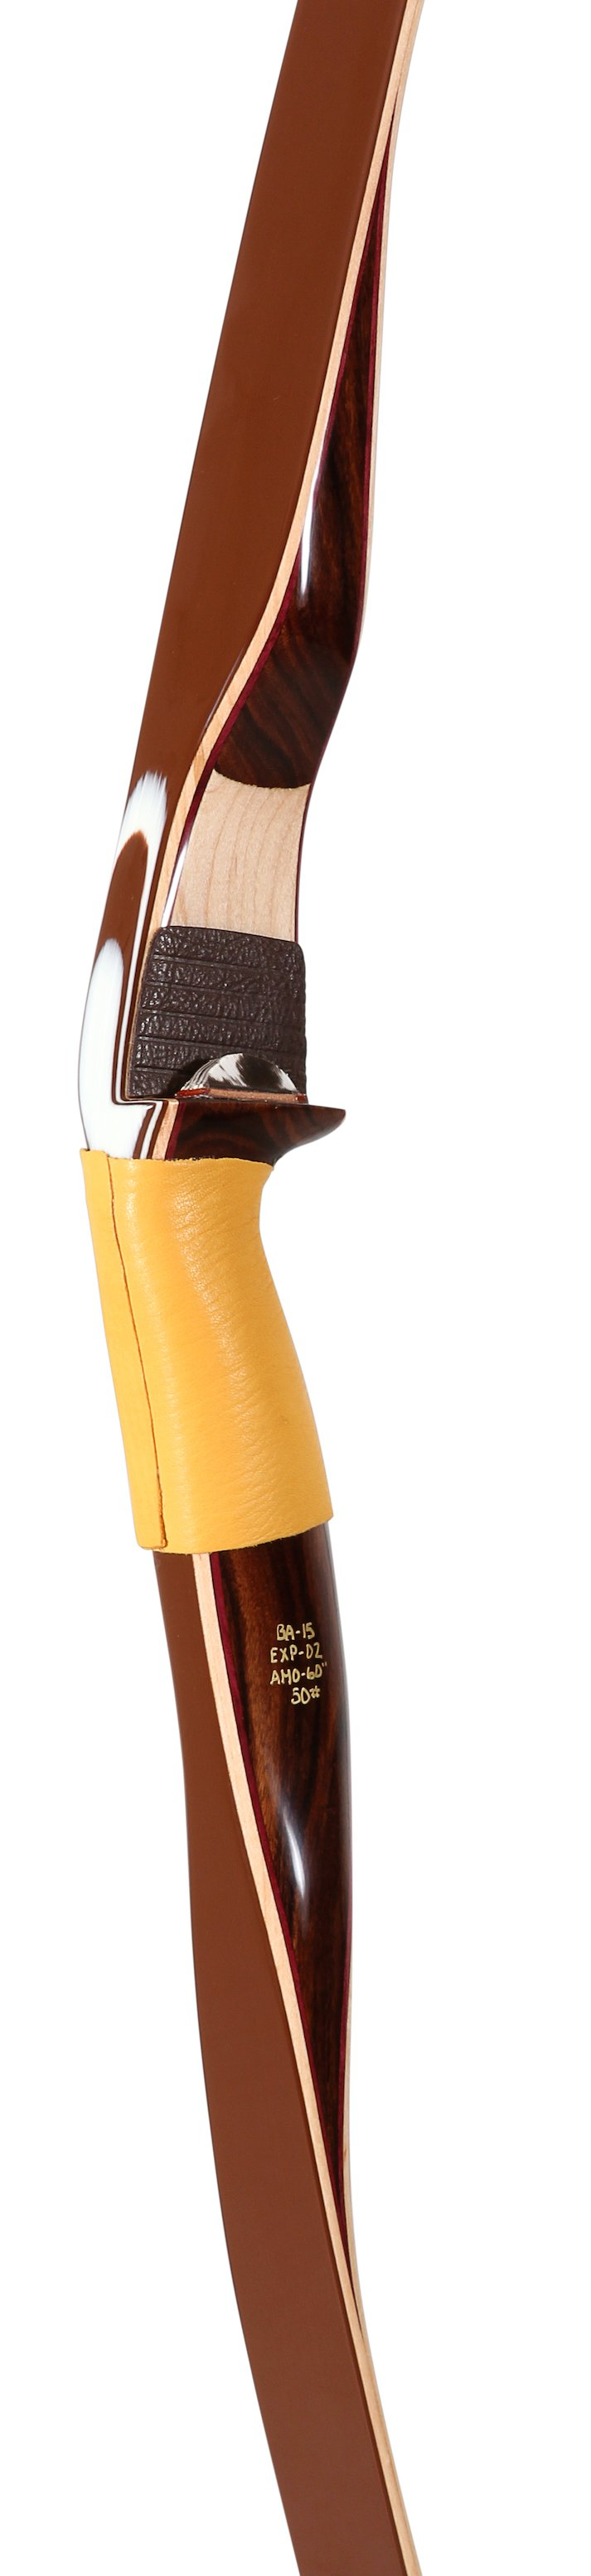 Bear Archery Kodiak Feldbogen Traditionell Weißer Ahorn LH / 35 lbs / satin